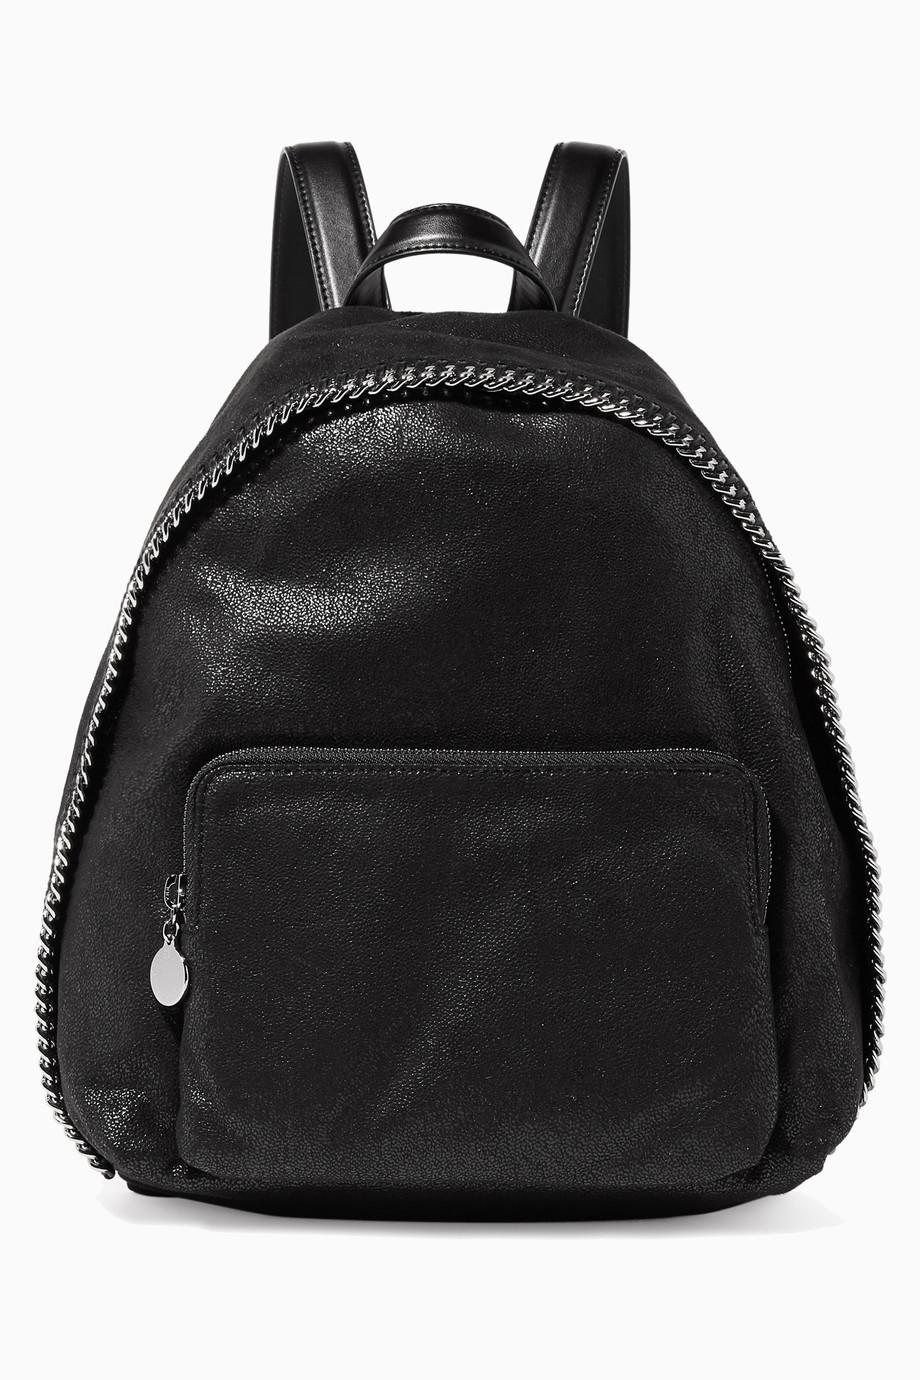 Shop Stella McCartney Black Black Falabella Shaggy Deer Backpack for ... c91ad9622bb6a